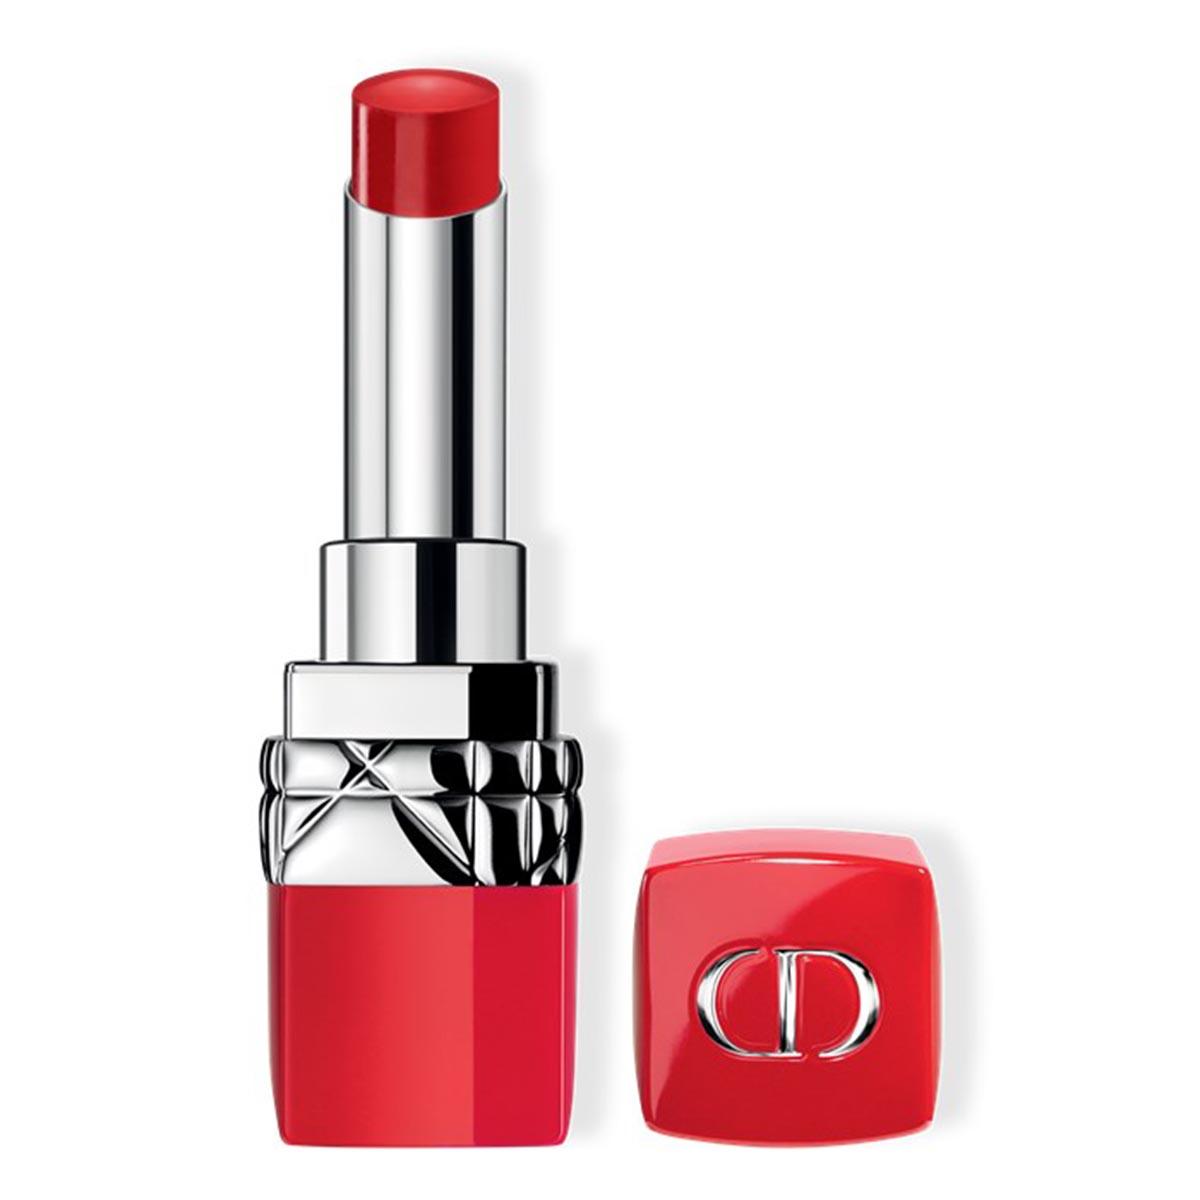 Dior rouge dior lipstick 587 ultra appeal